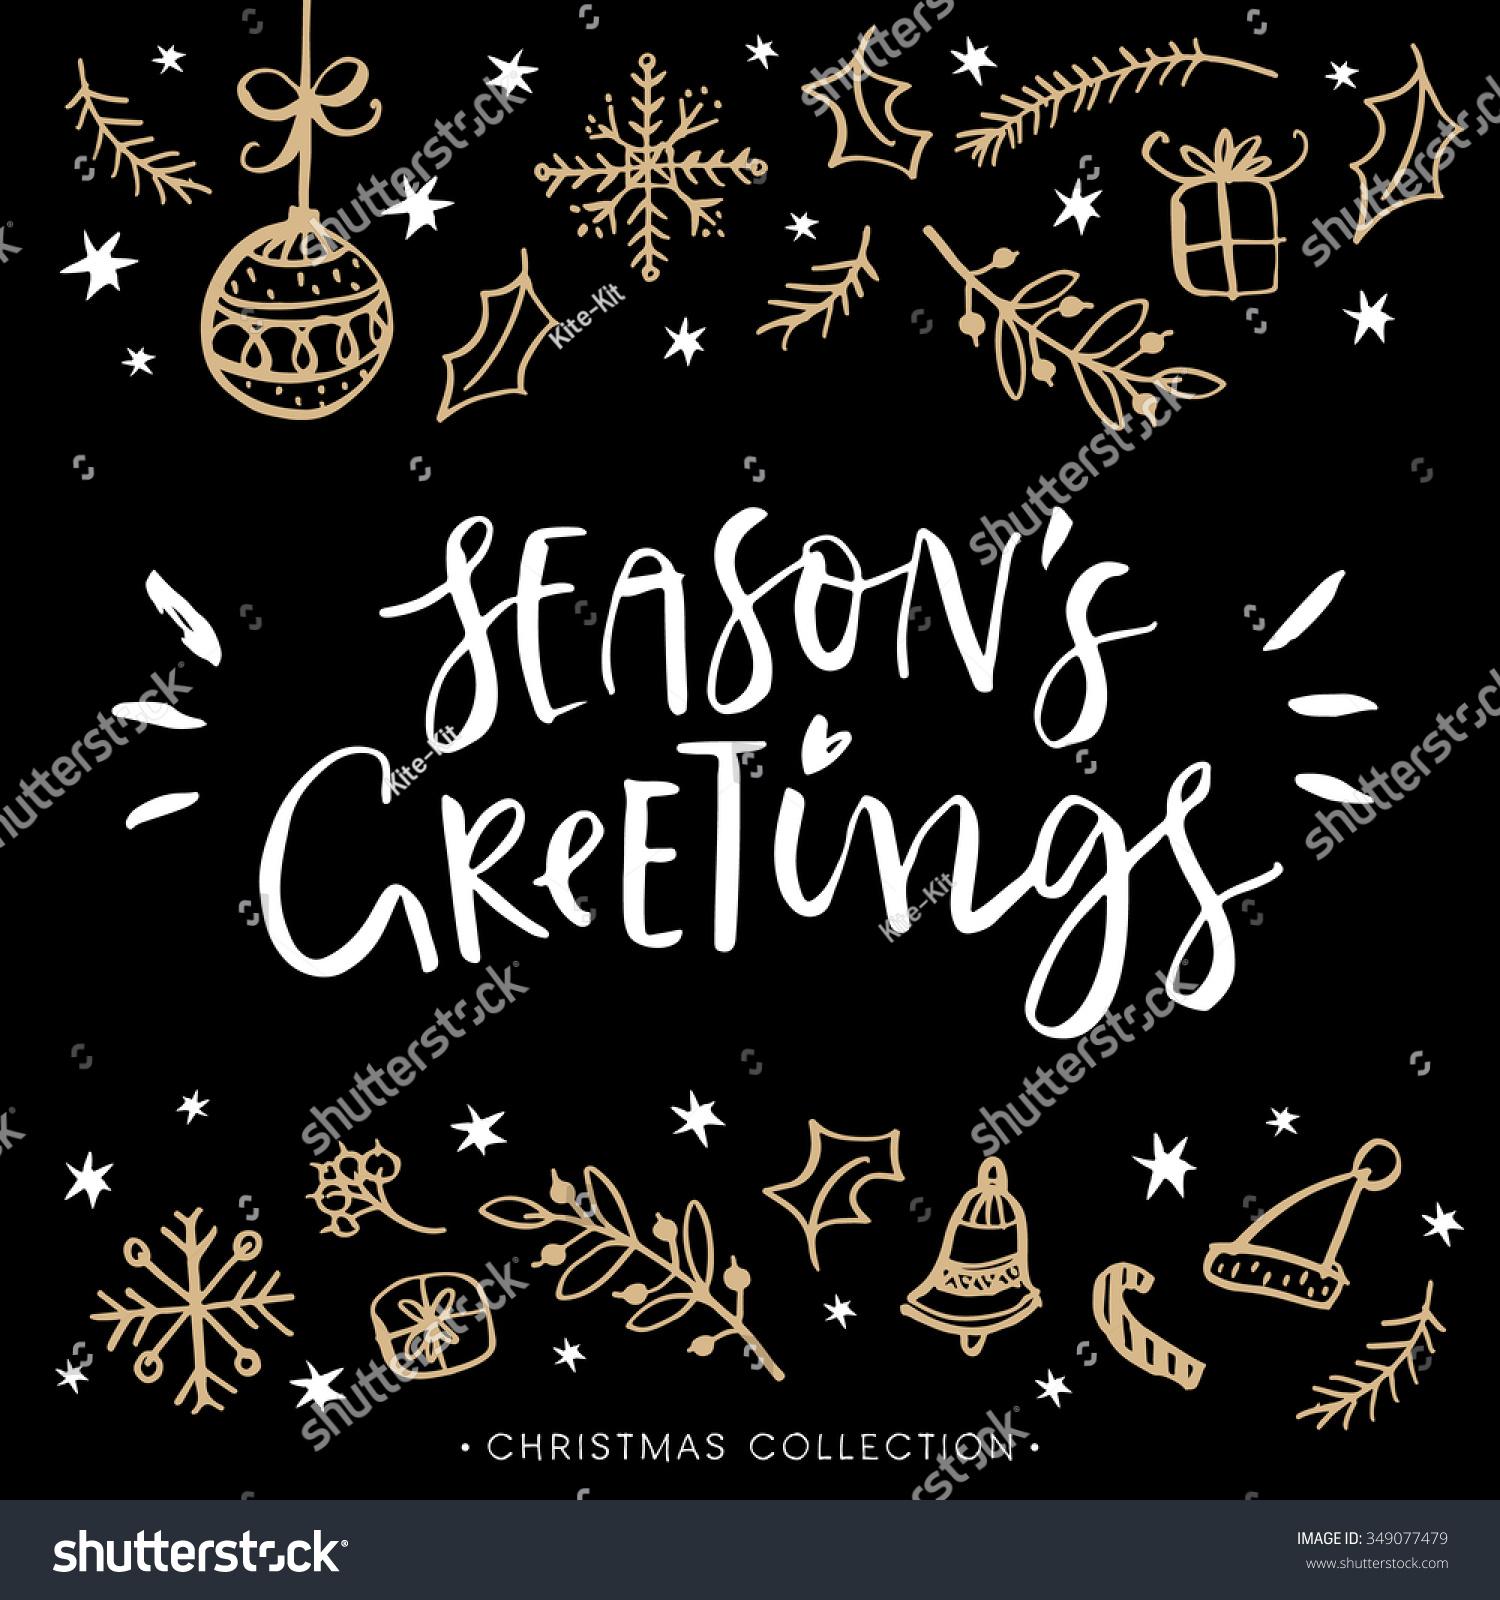 Seasons Greetings Christmas Greeting Card Calligraphy